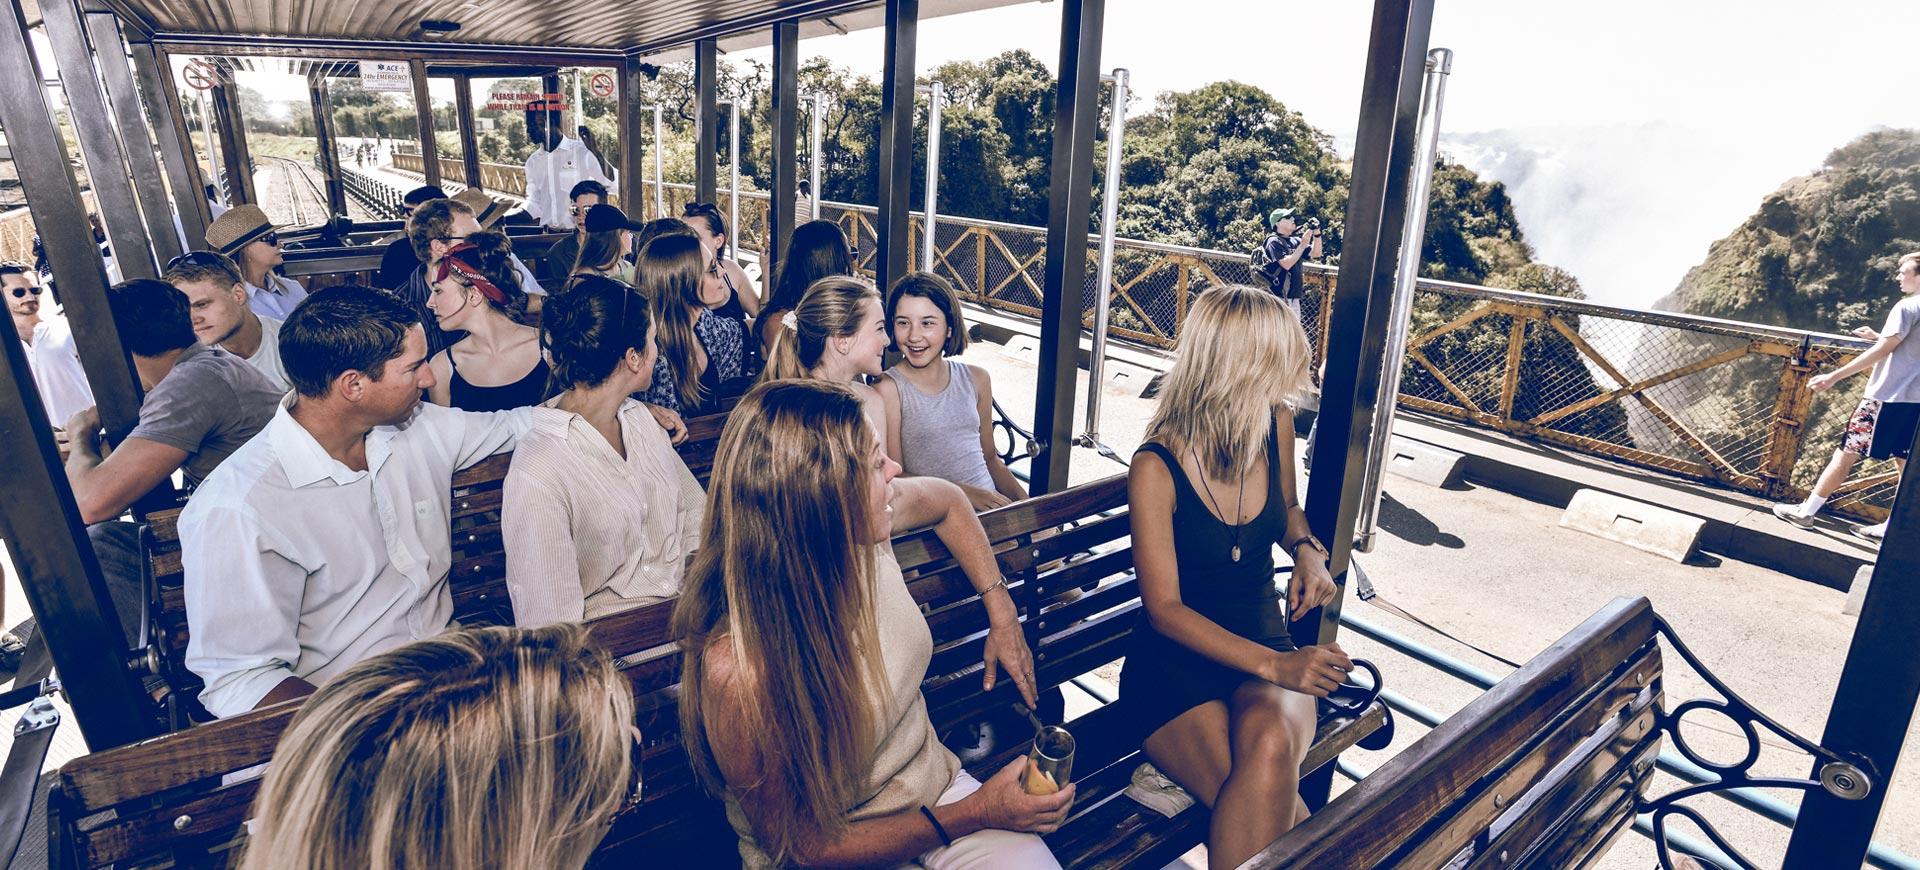 Victoria Falls Tram Tour